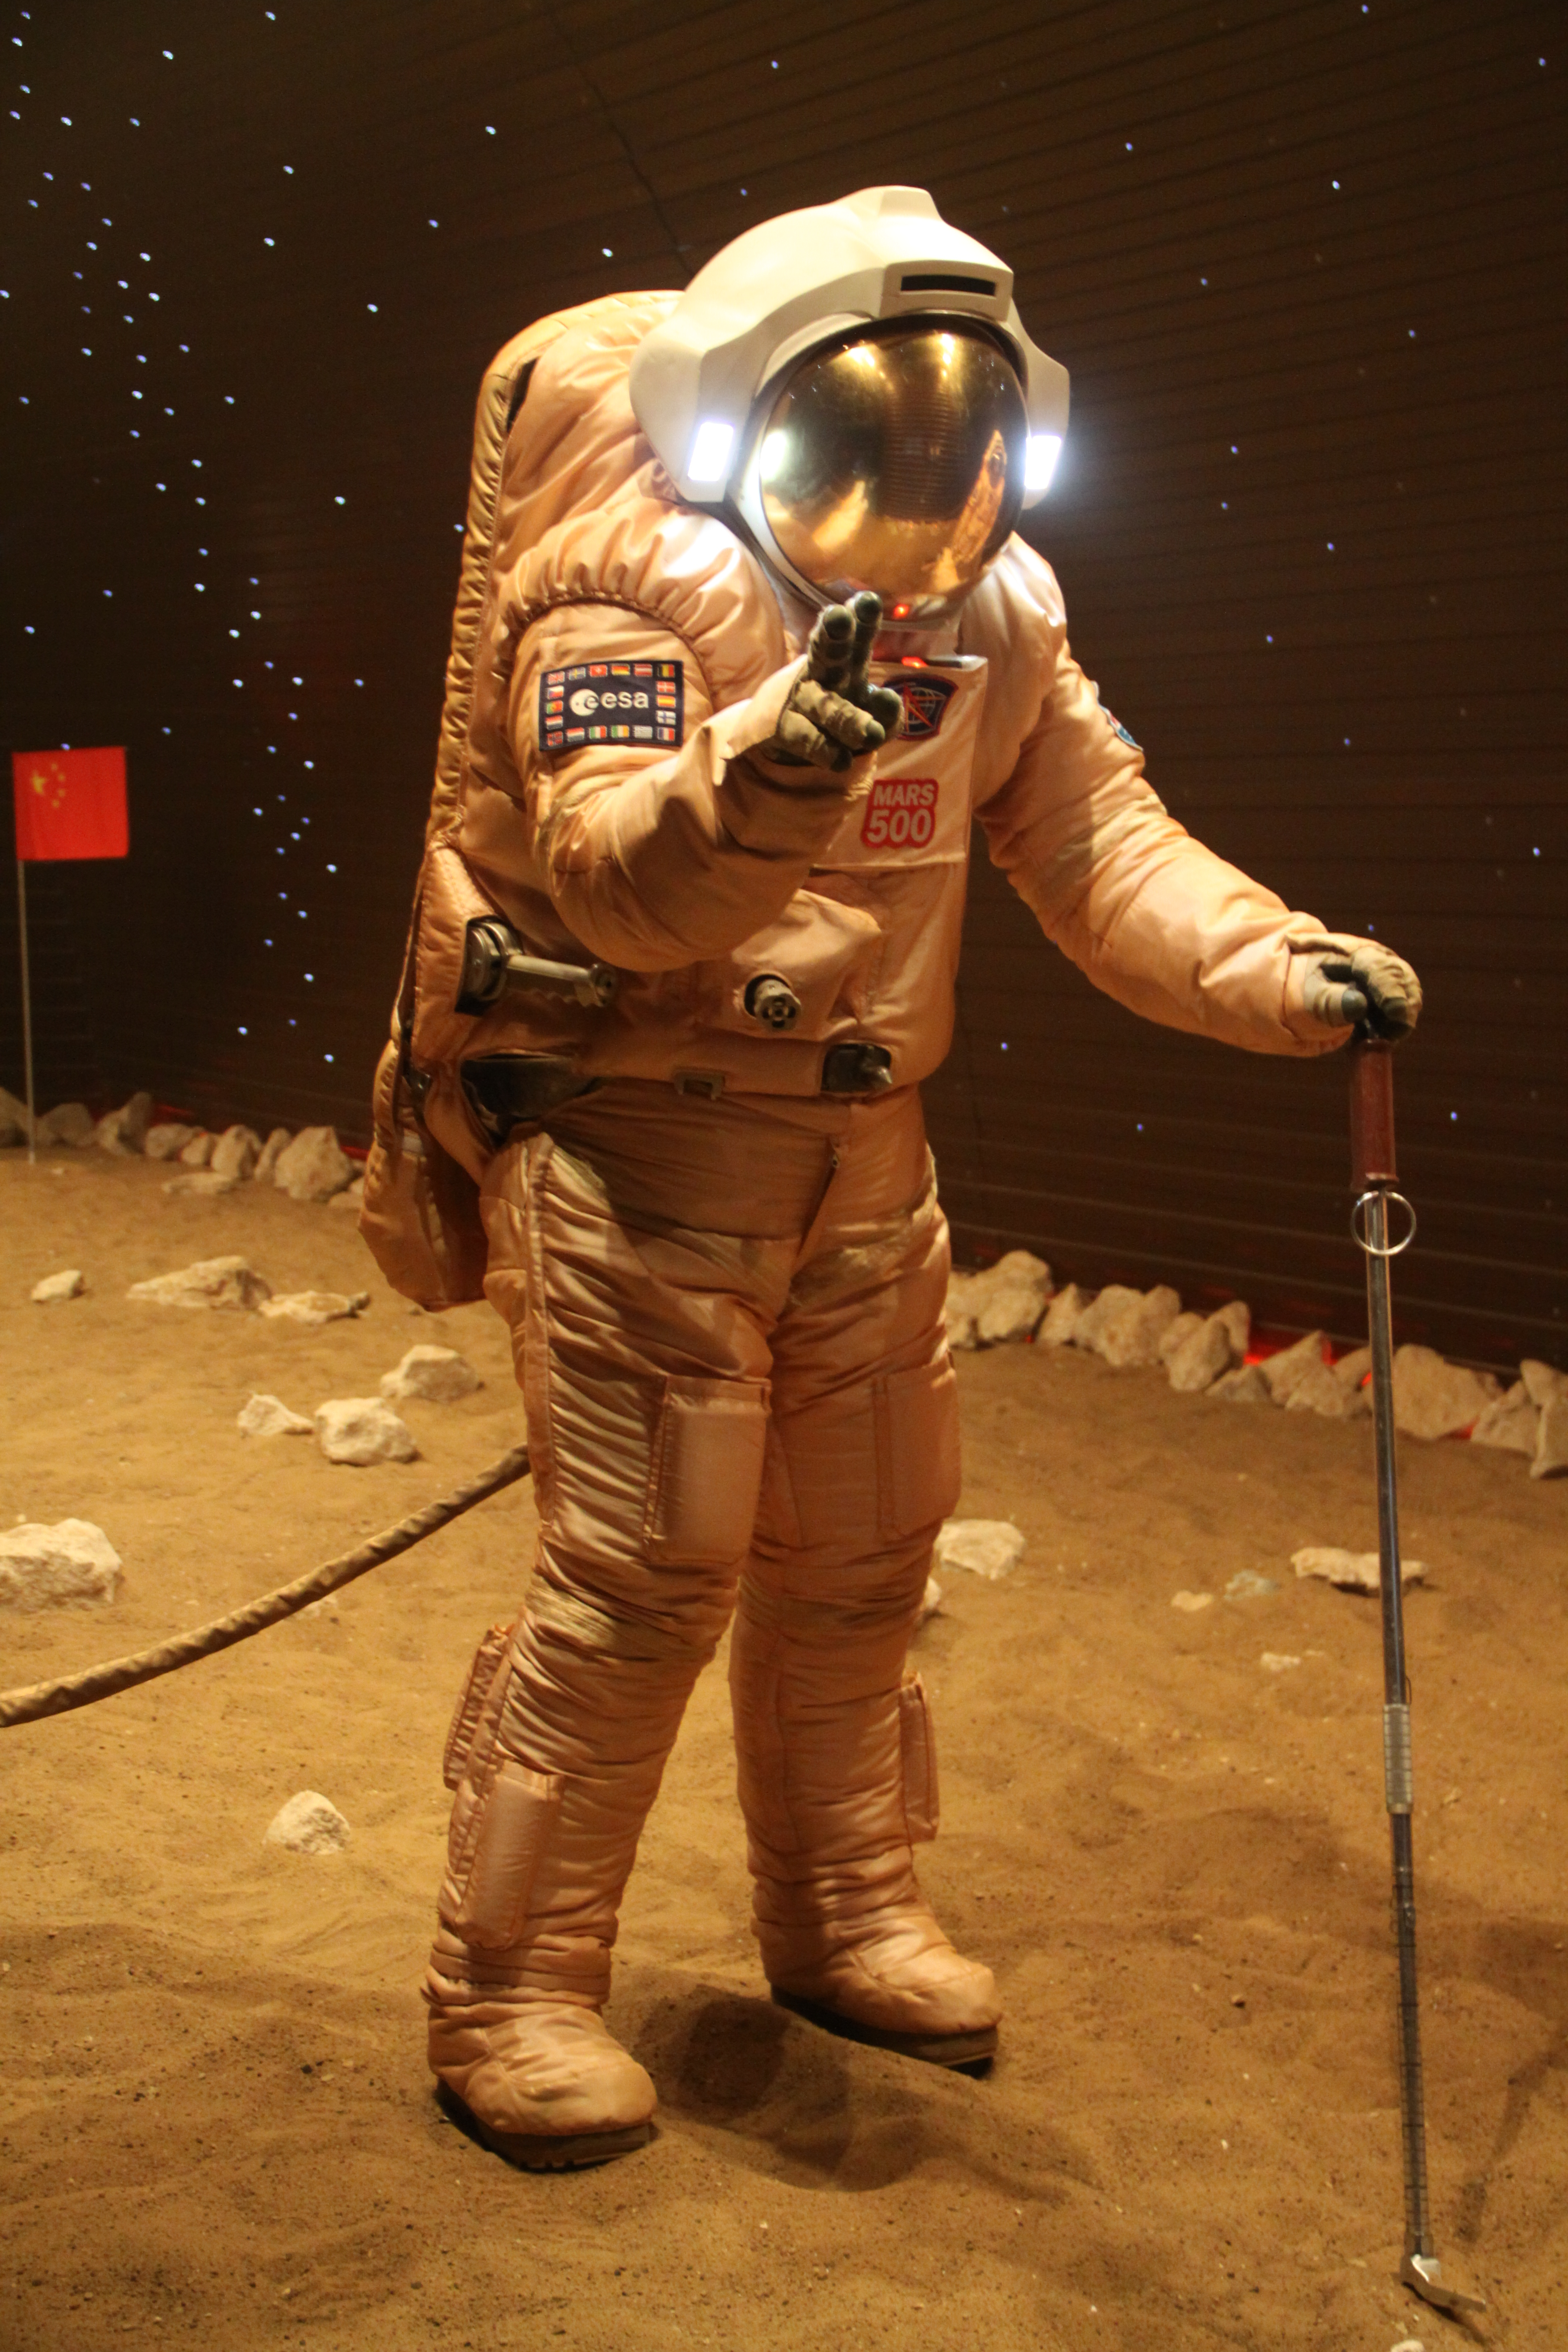 Mars500 Astronaut Diego Urbina Takes